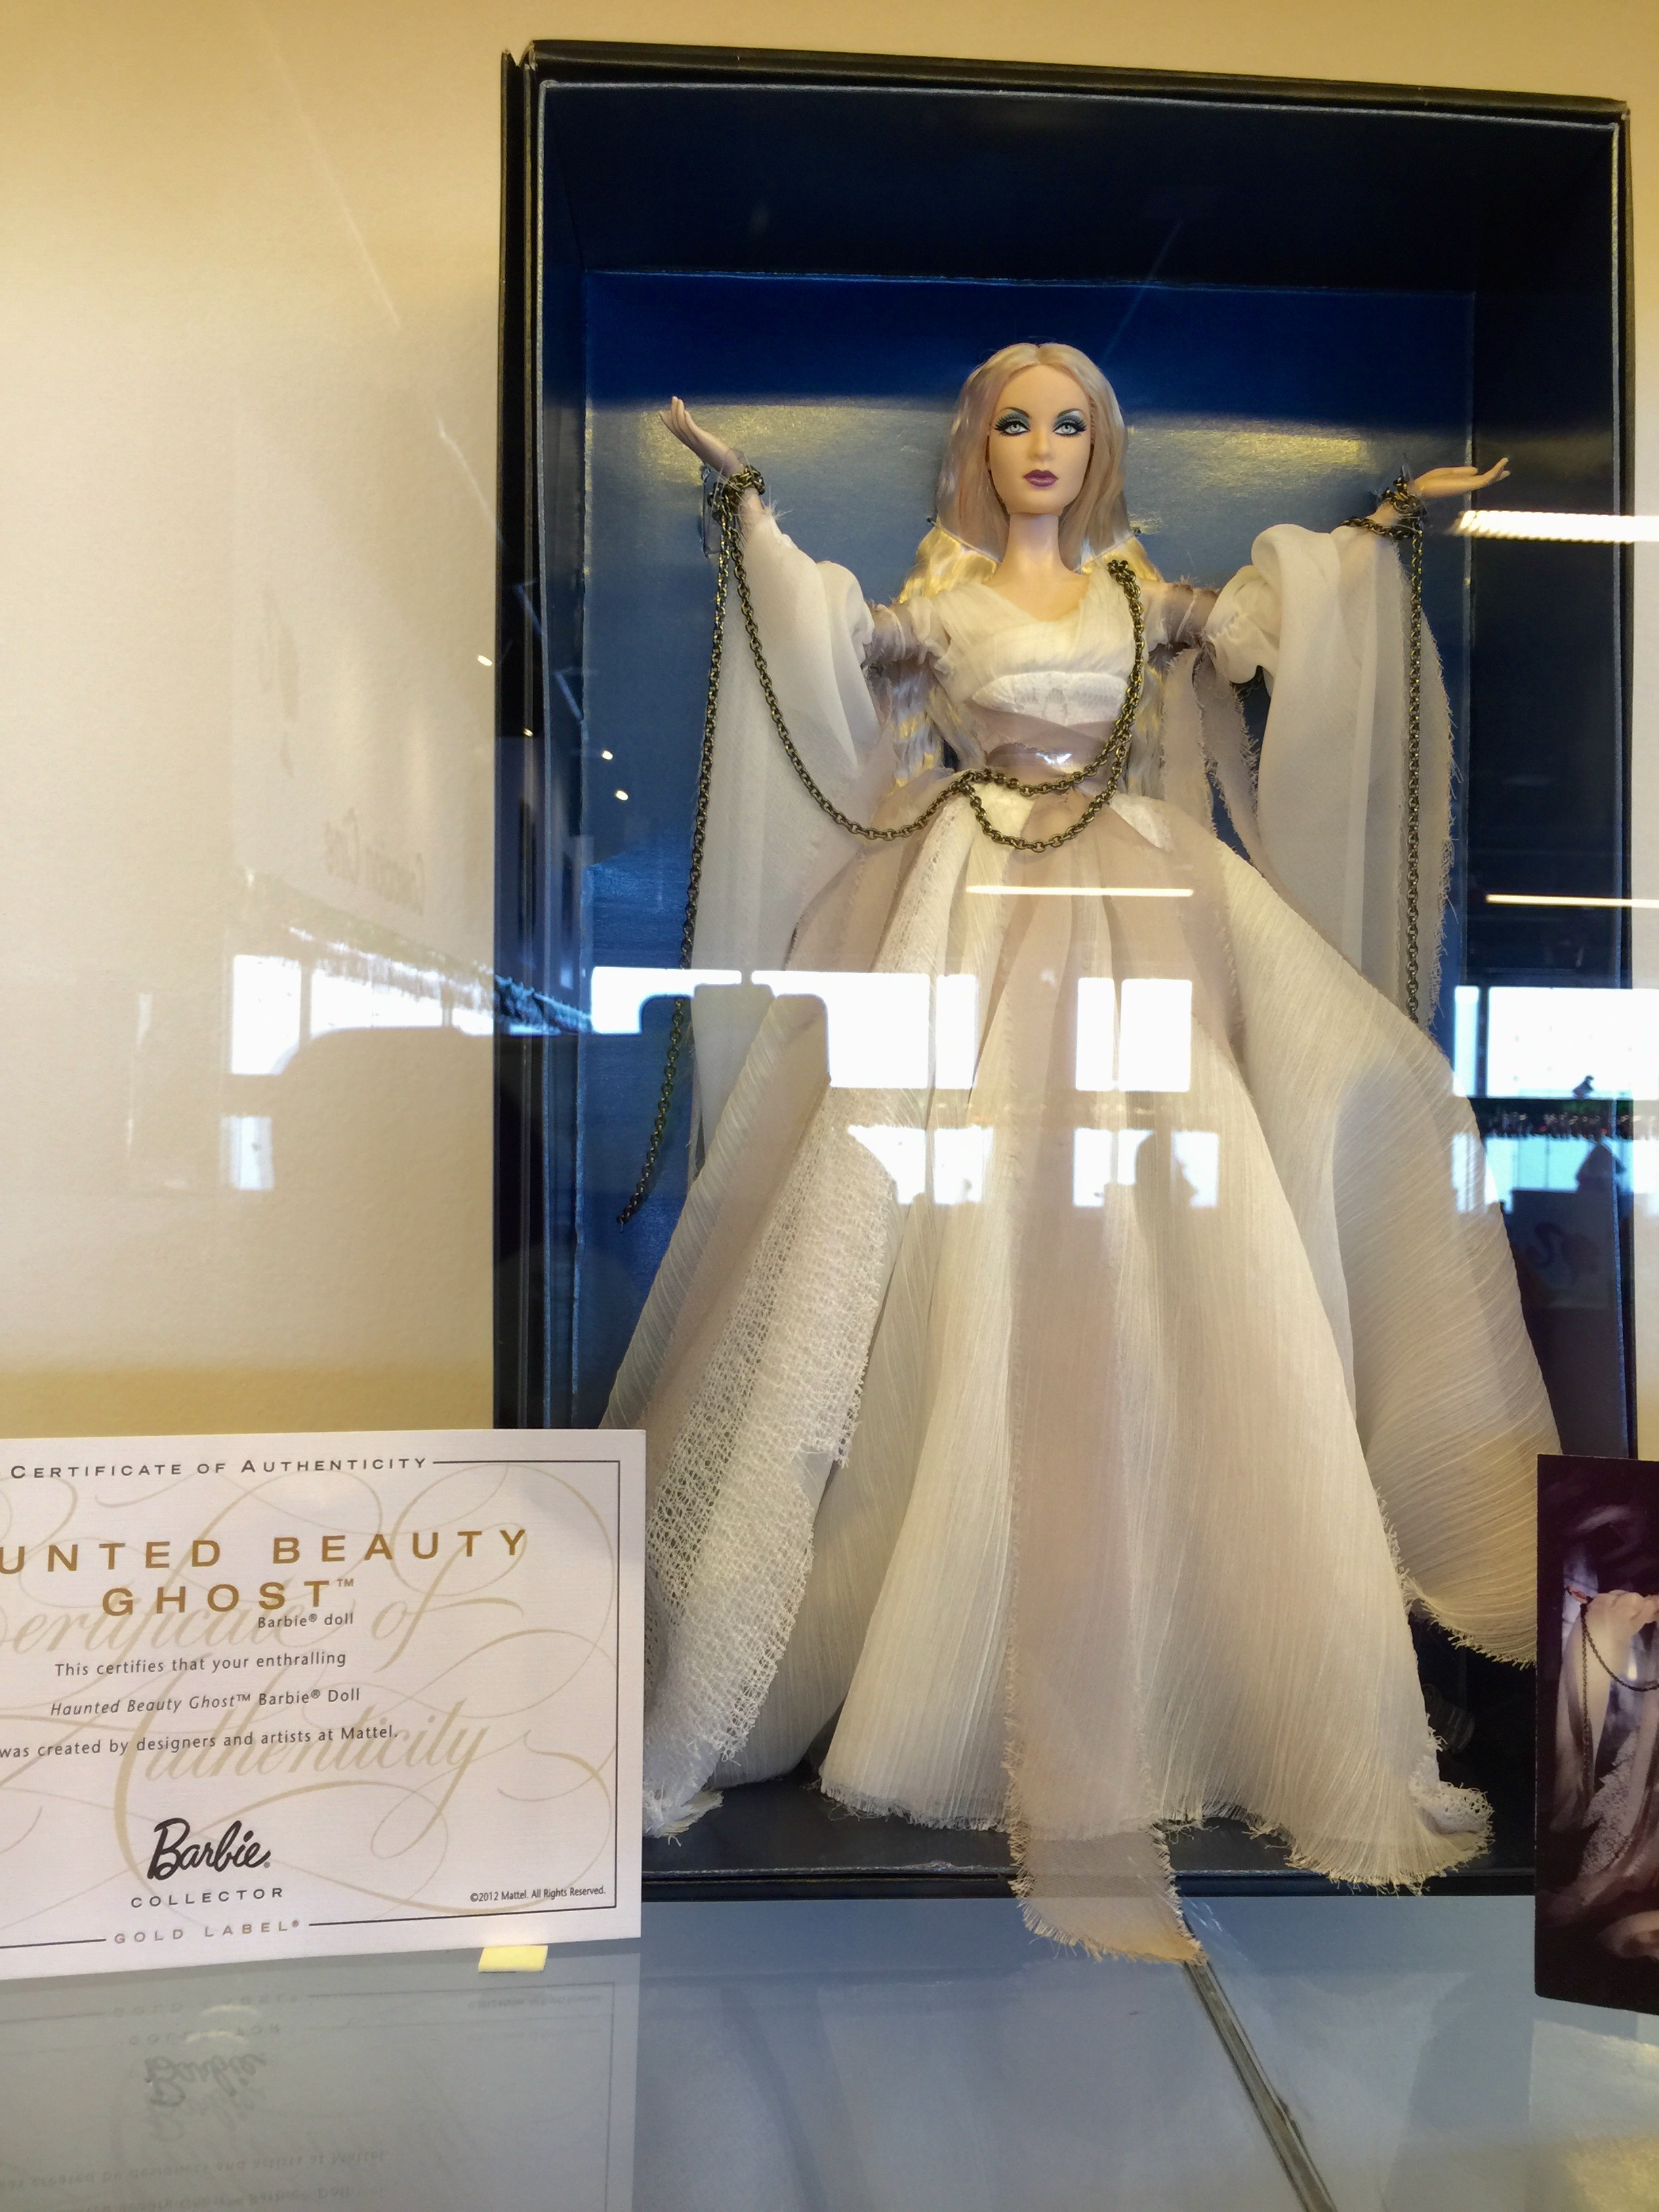 Welp Barbie visit the Torre Latinoamericana TK-96